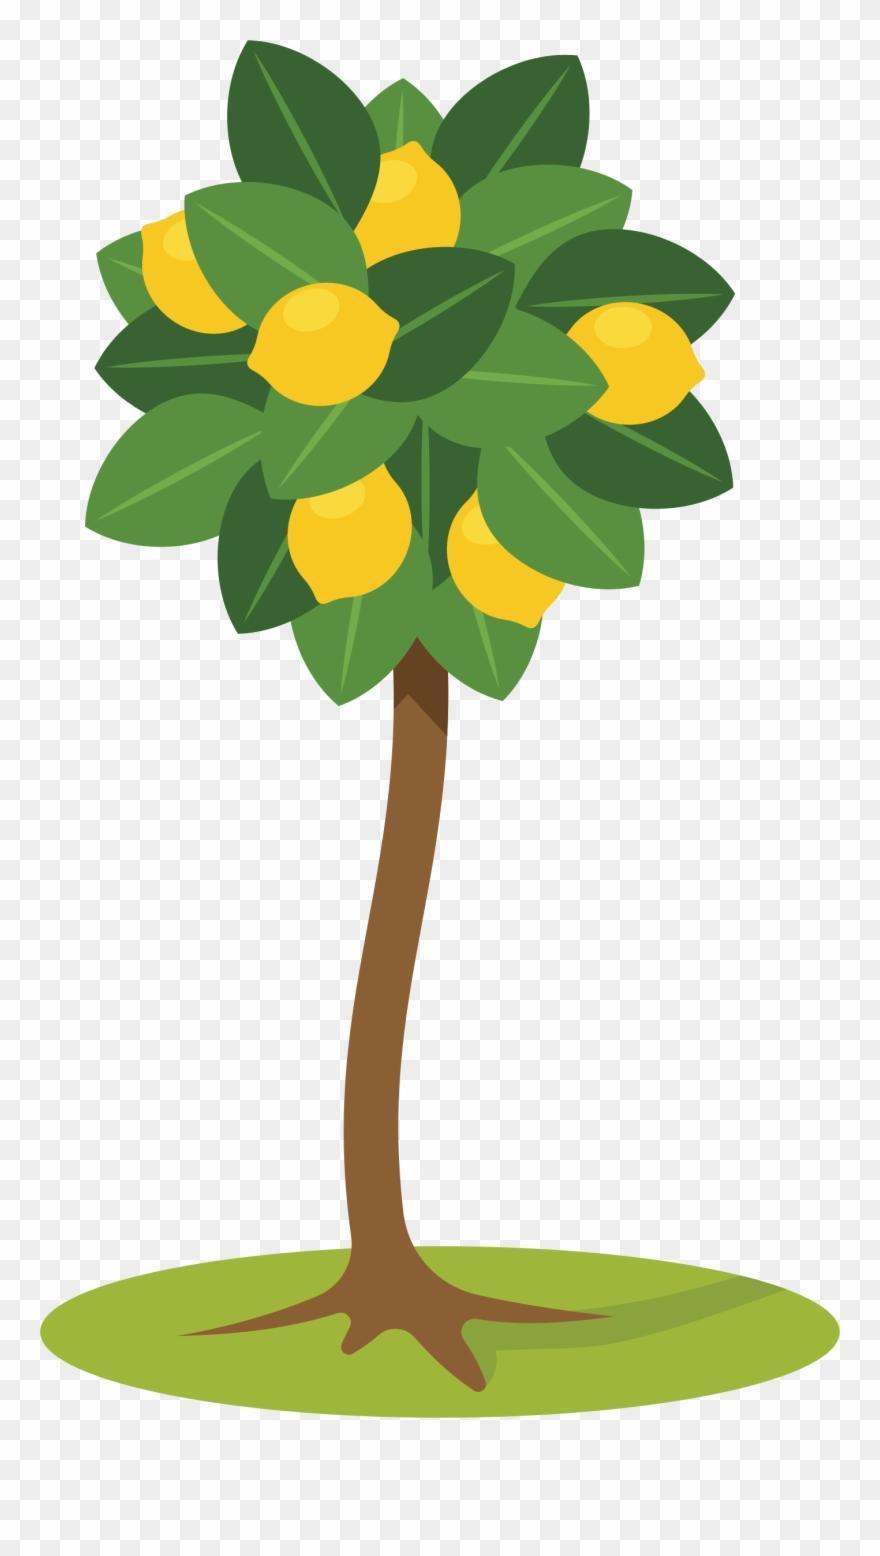 medium resolution of lemon tree clipart farm lemon tree clipart png download